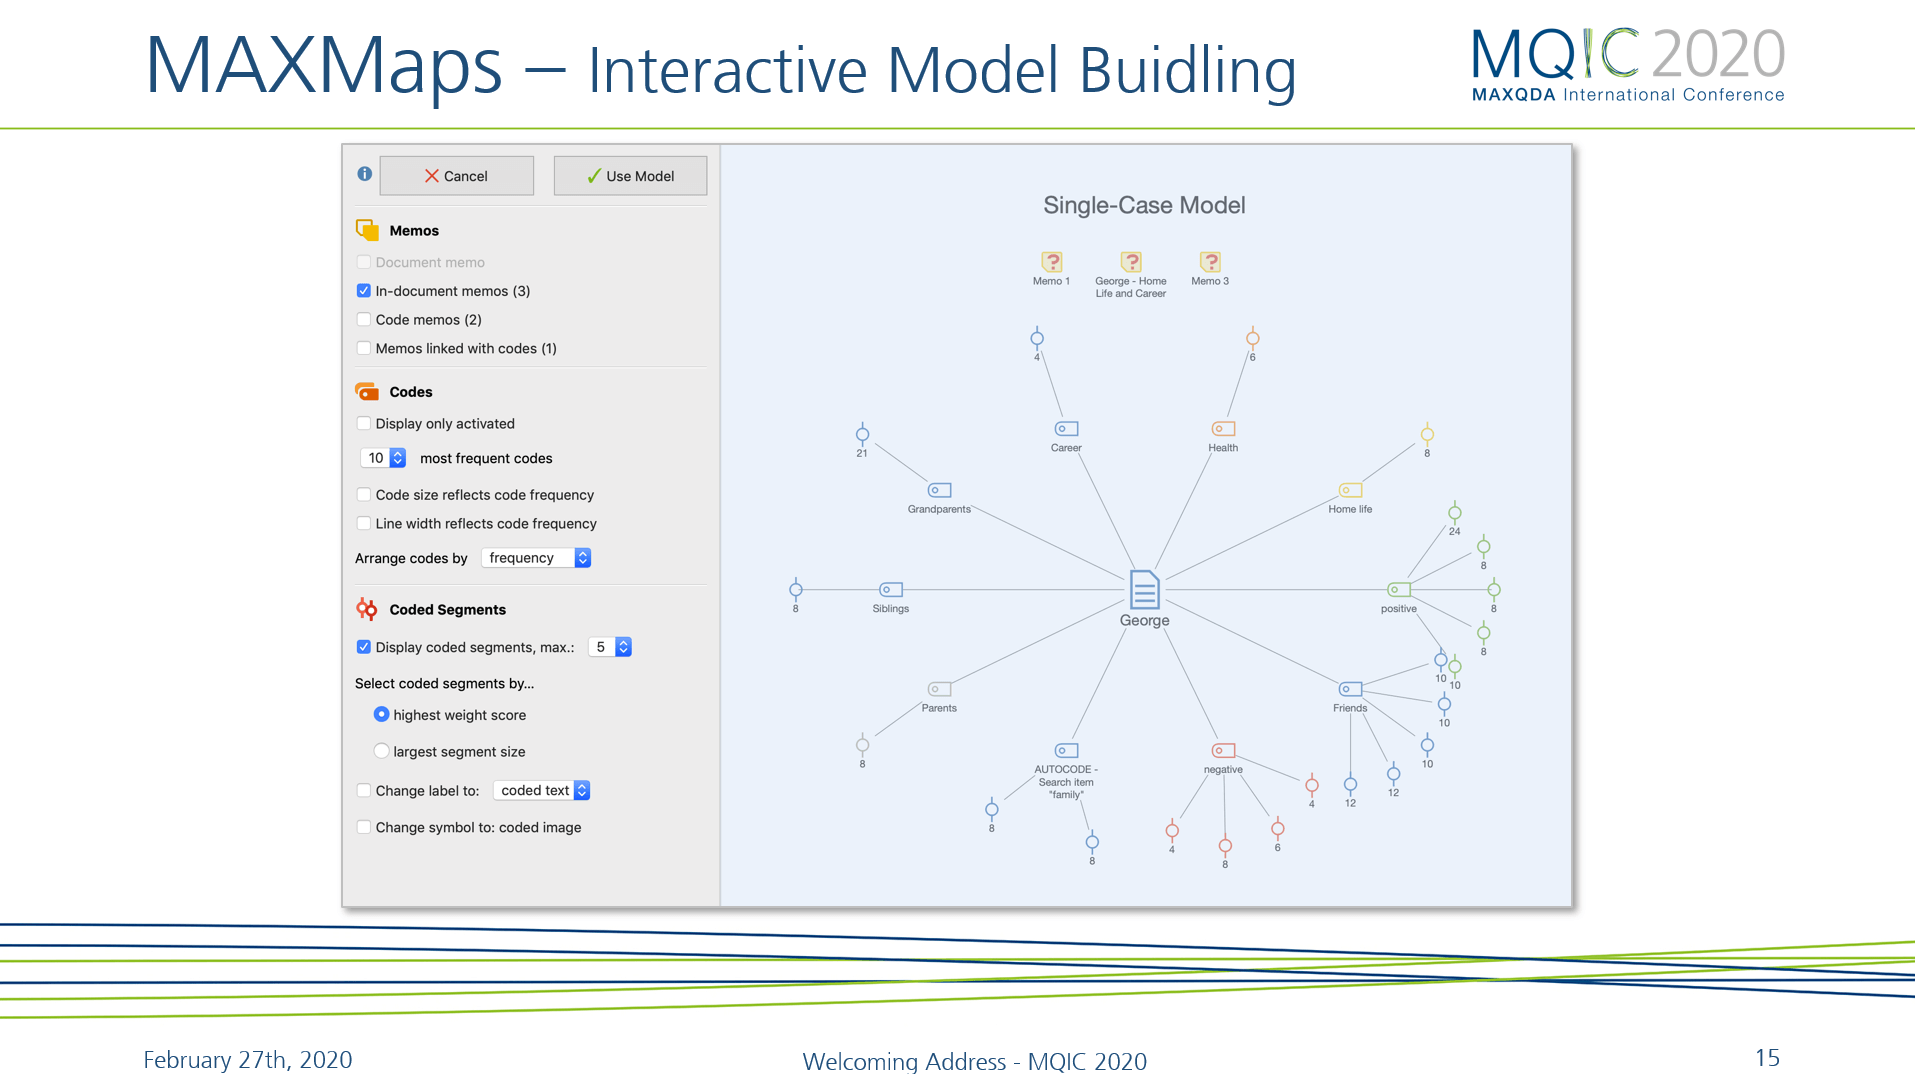 MAXQDA 2020 MAXMaps feature